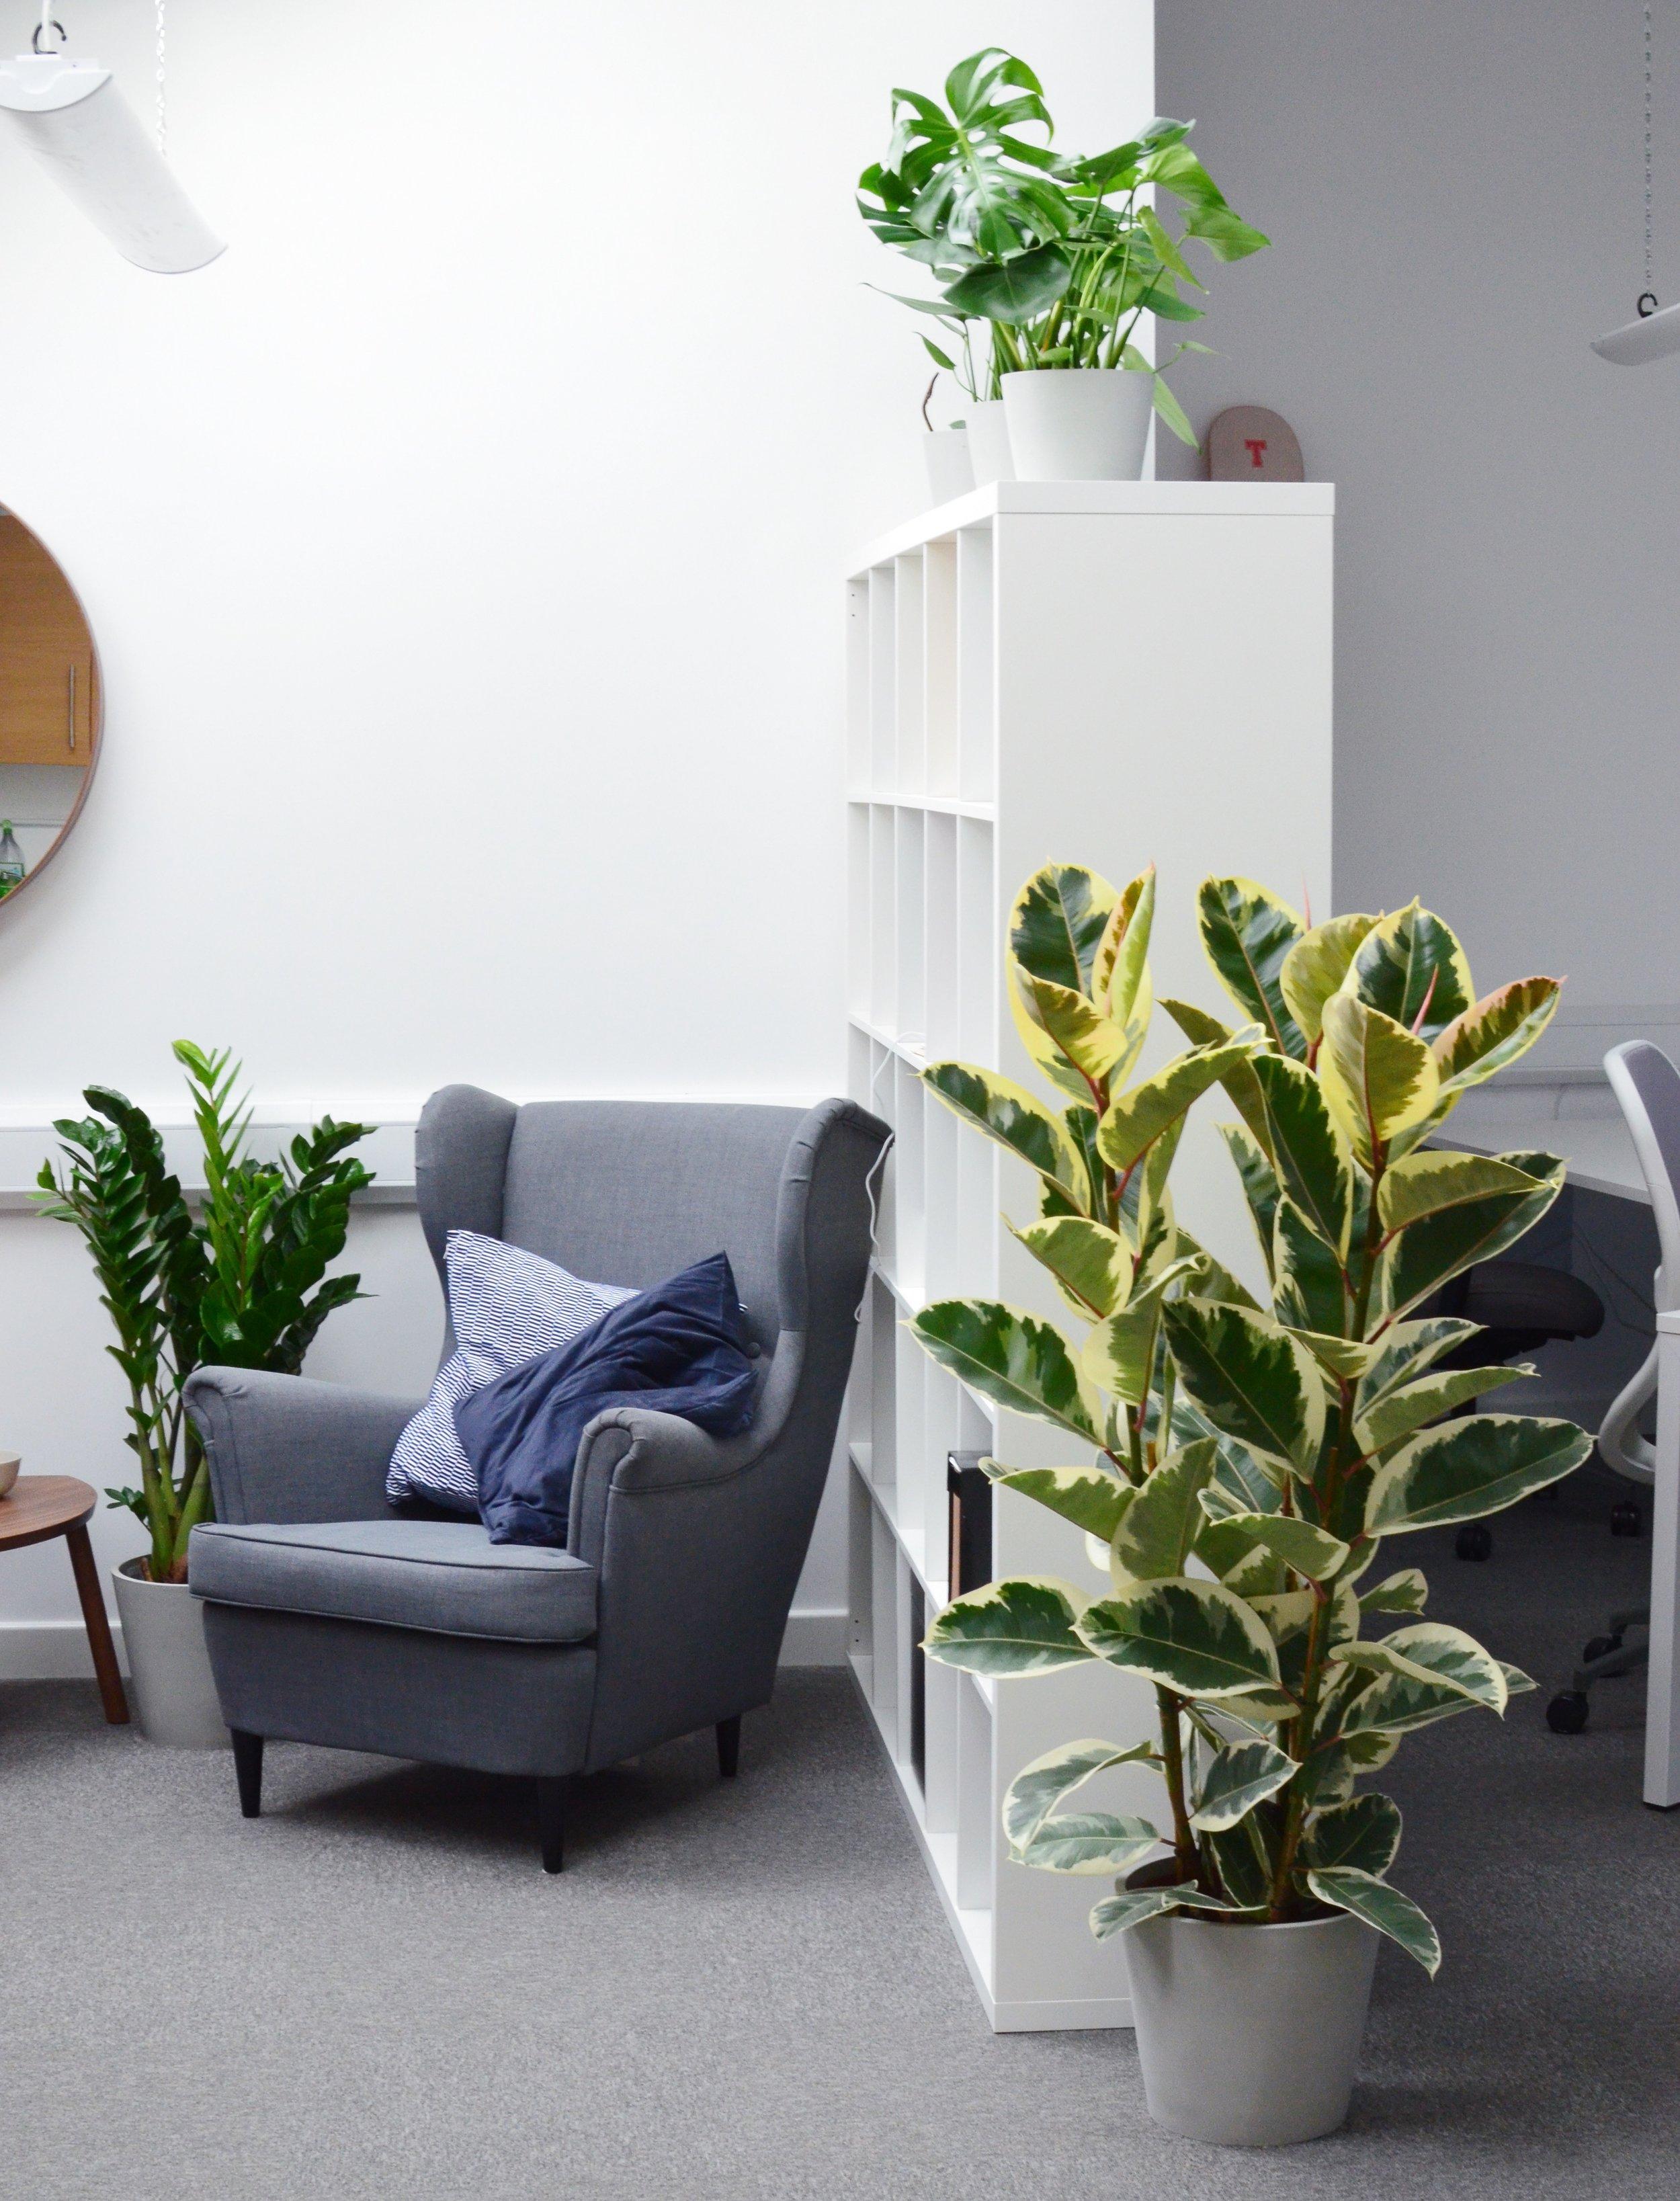 Pilea Plant Shop Houseplant Office Installation.JPG